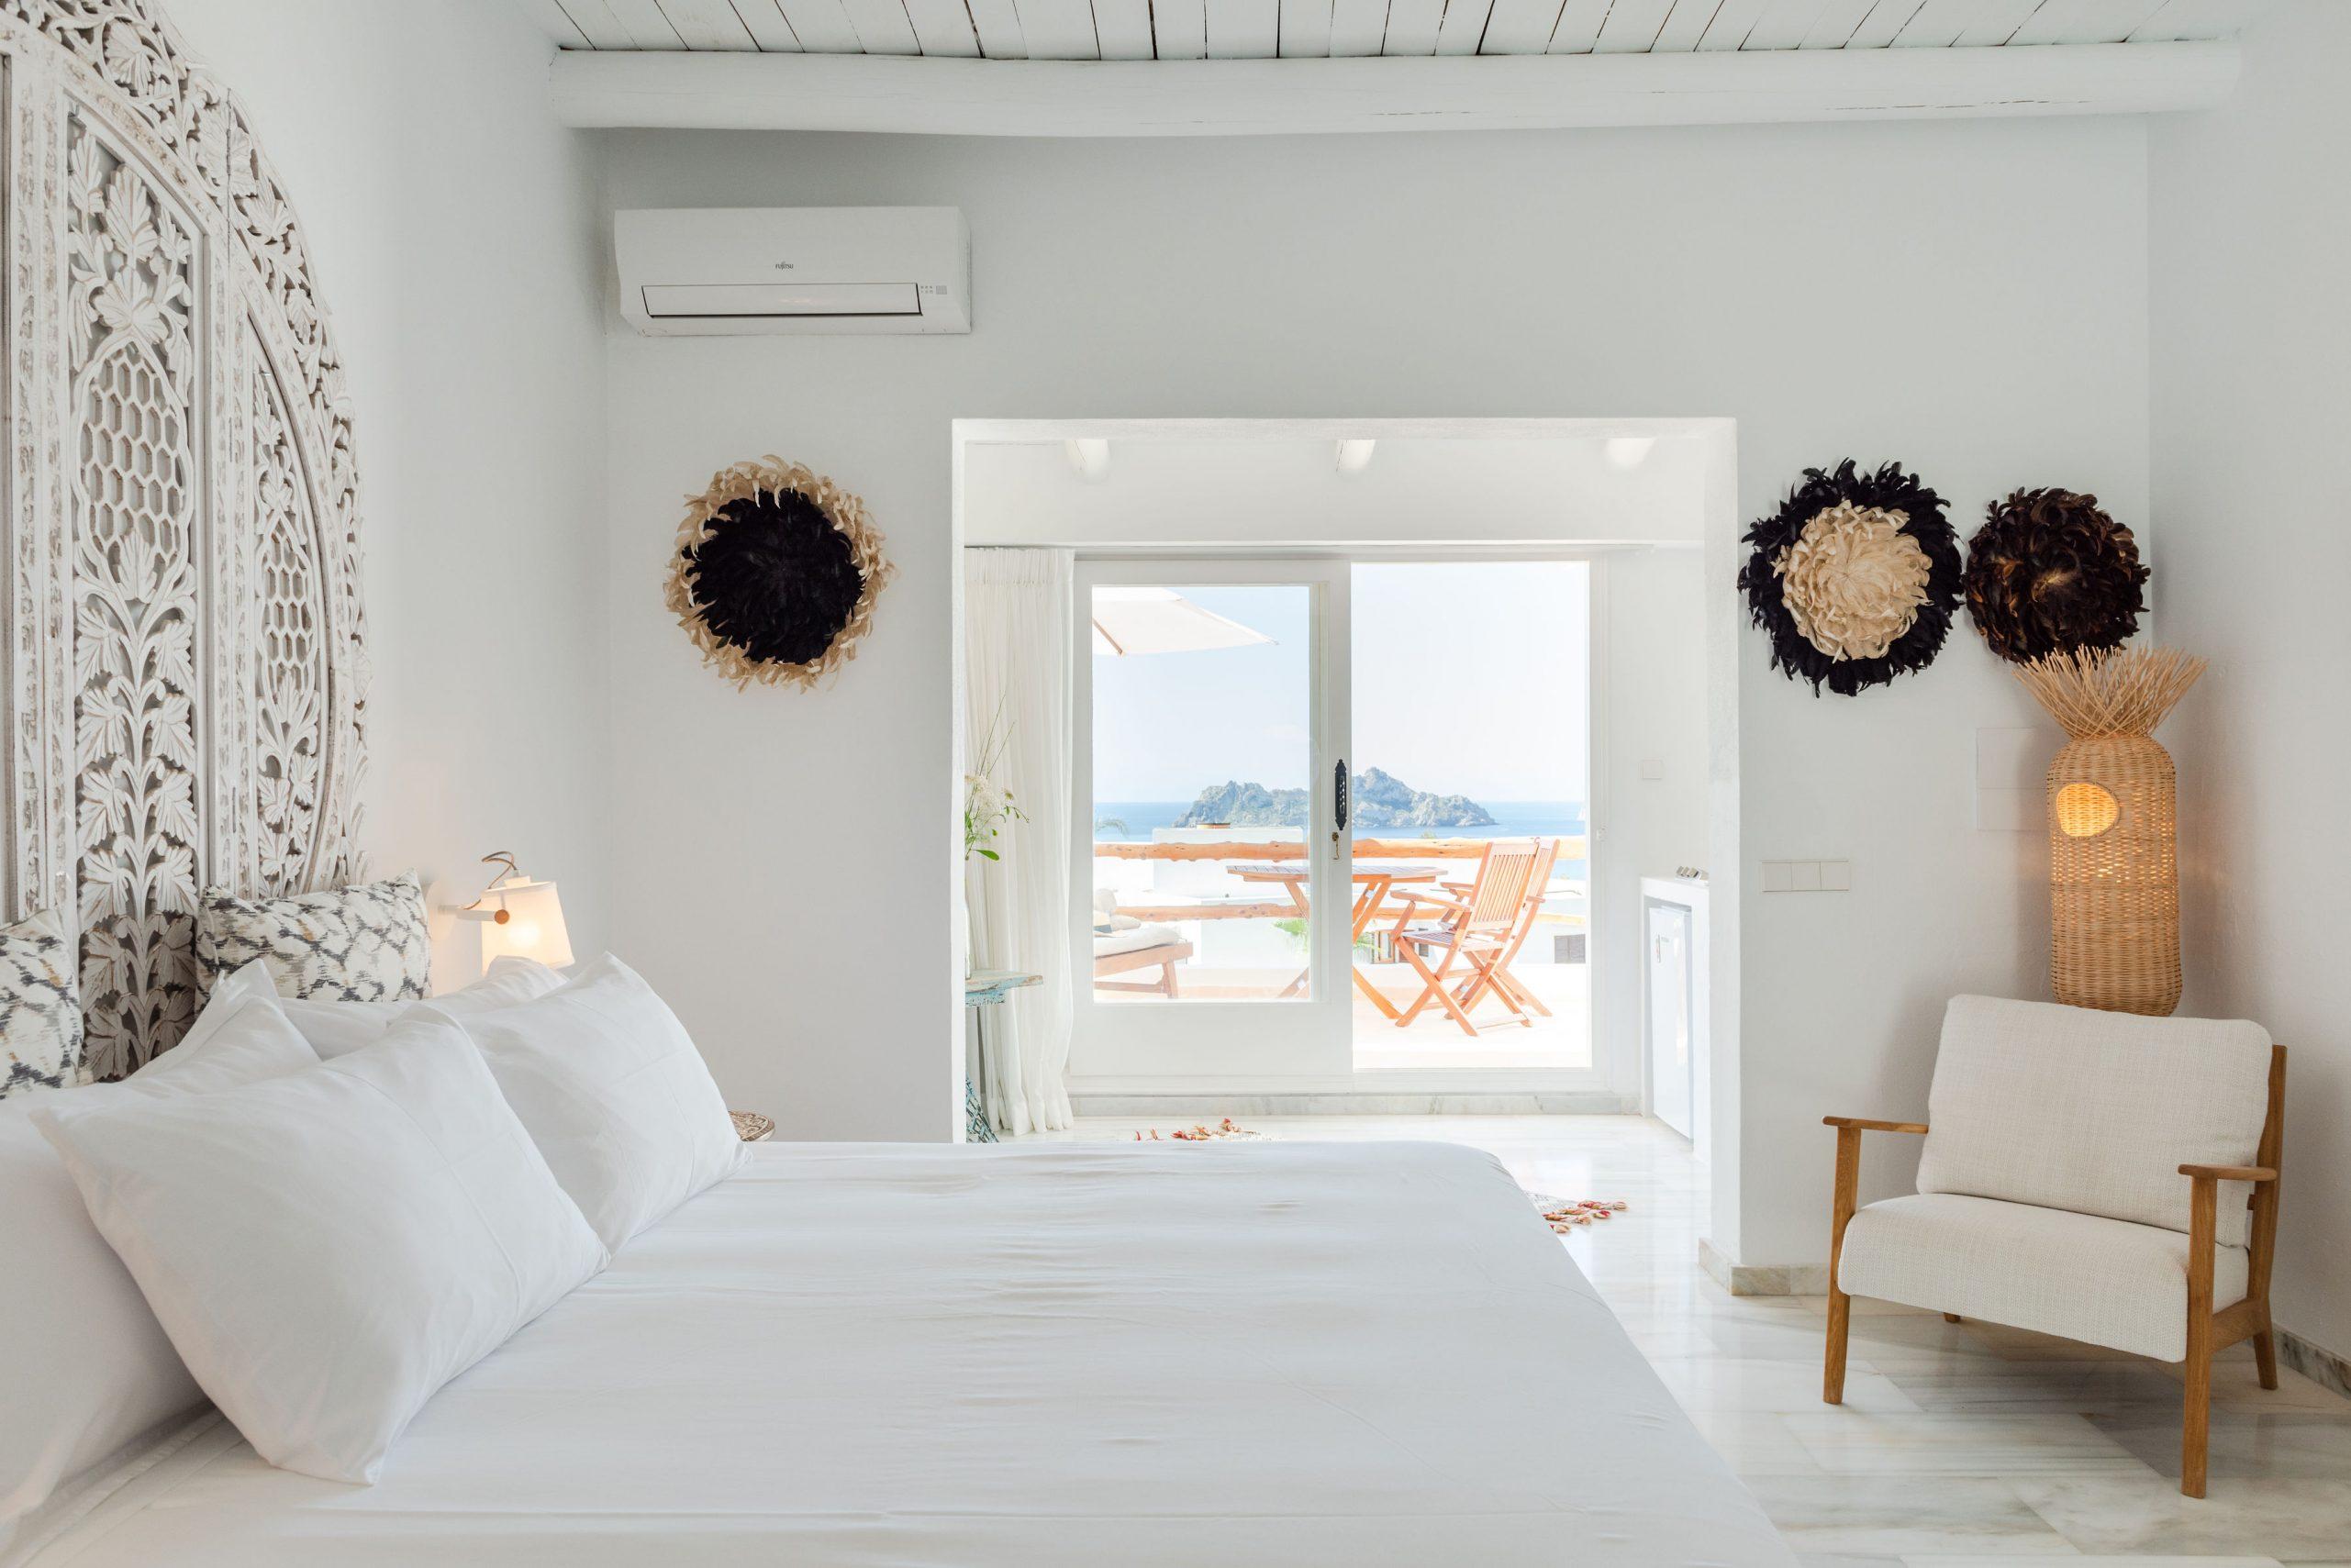 Petunia | Ibiza | Niche Travel Guides